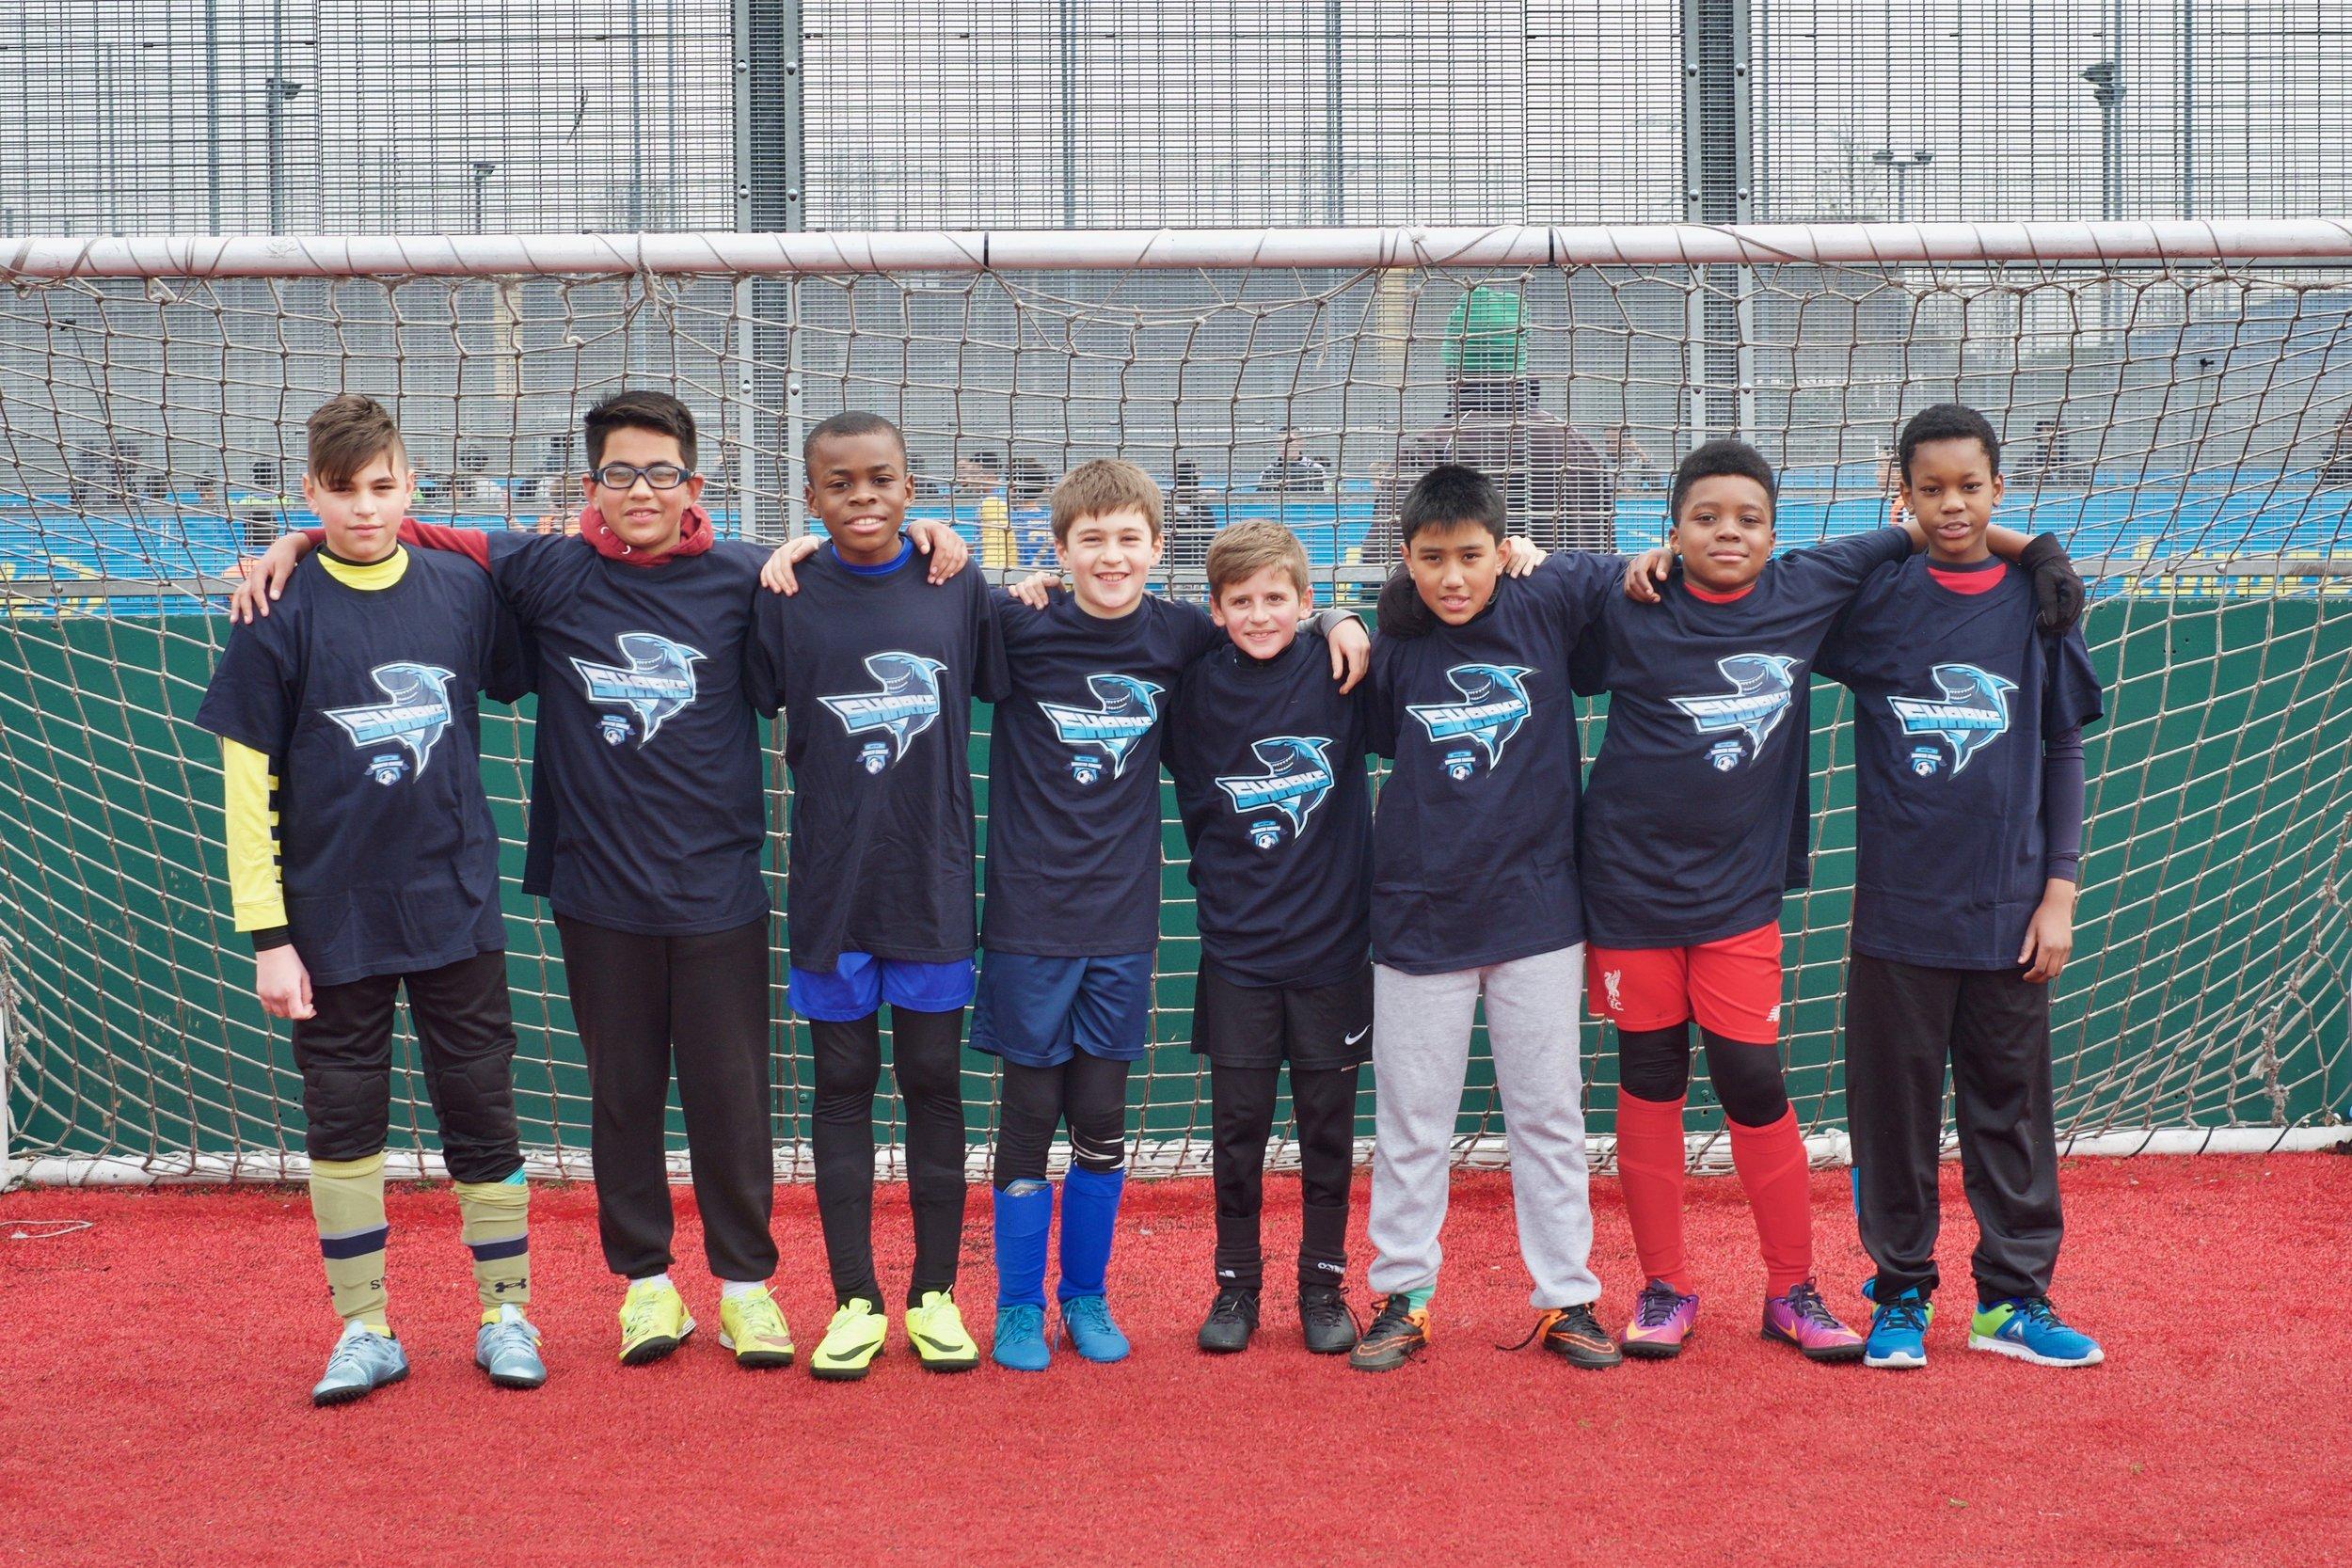 Edmonton Rangers Football Club U12s - The Sharks